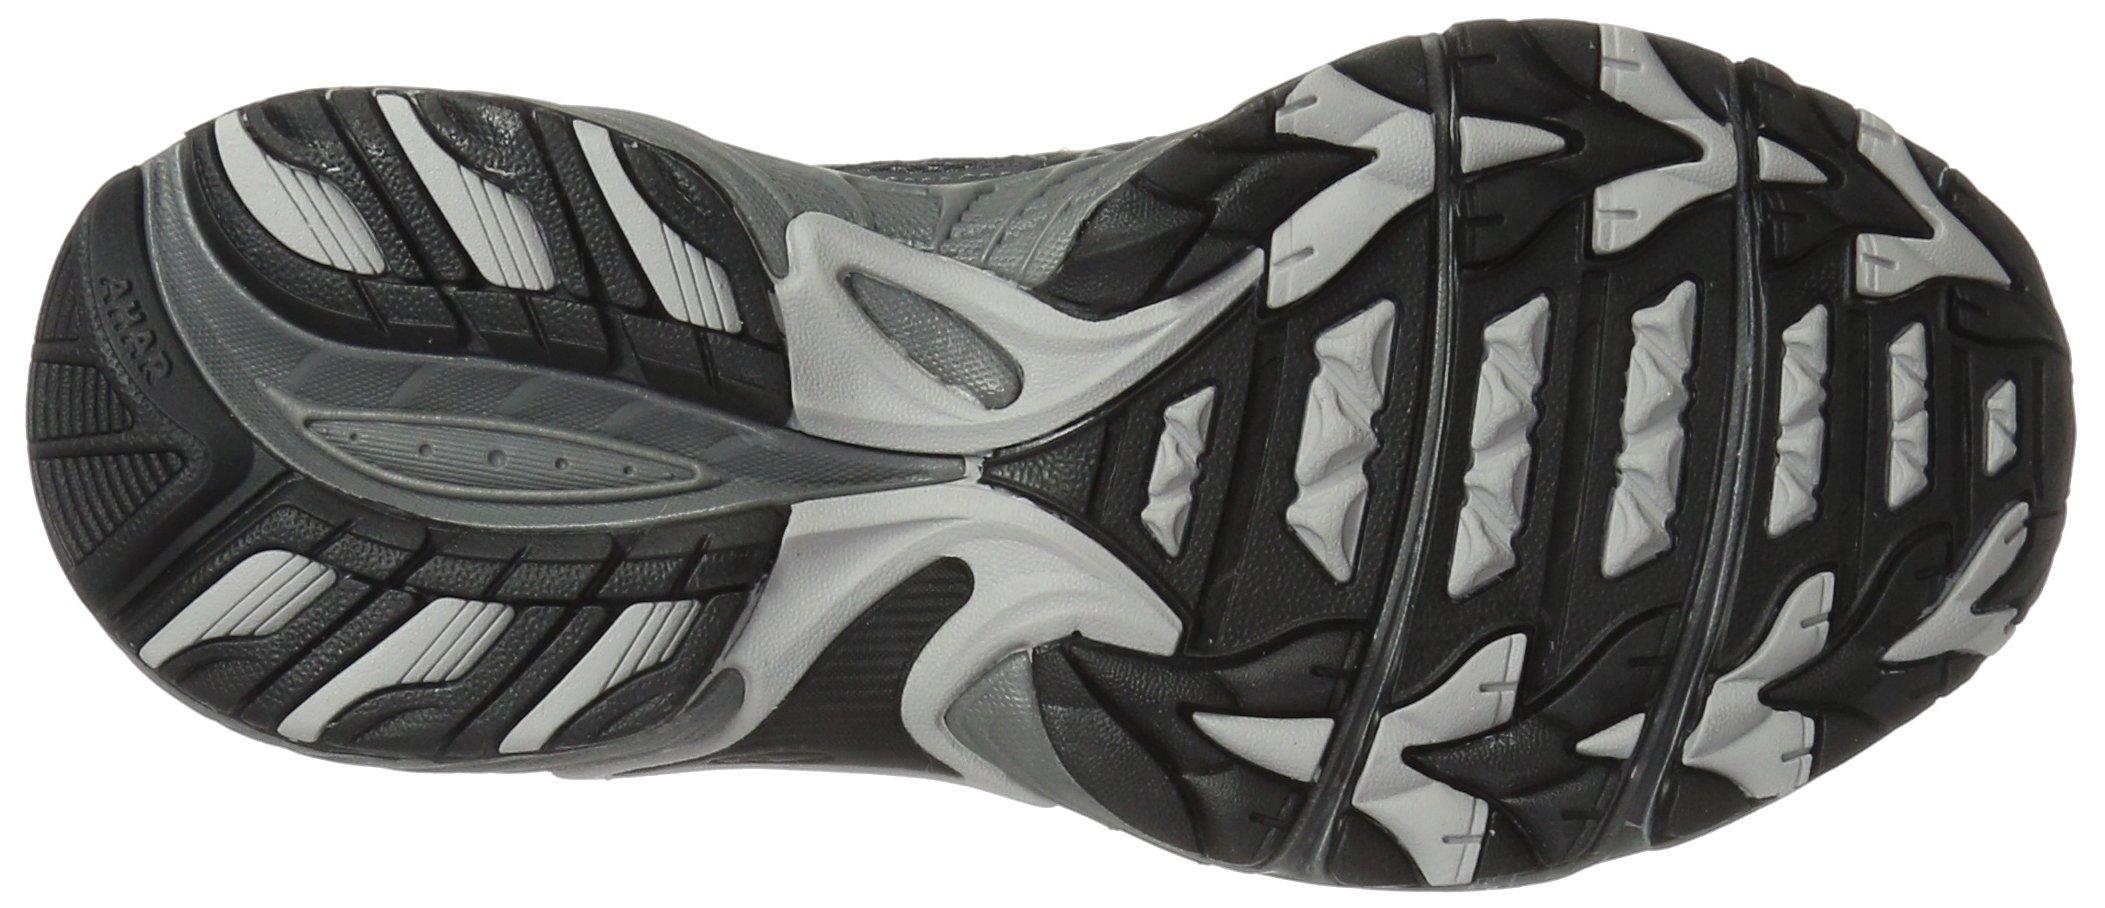 ASICS Men's Gel-Venture 5-M, Black/Onyx/Charcoal, 8 M US by ASICS (Image #3)